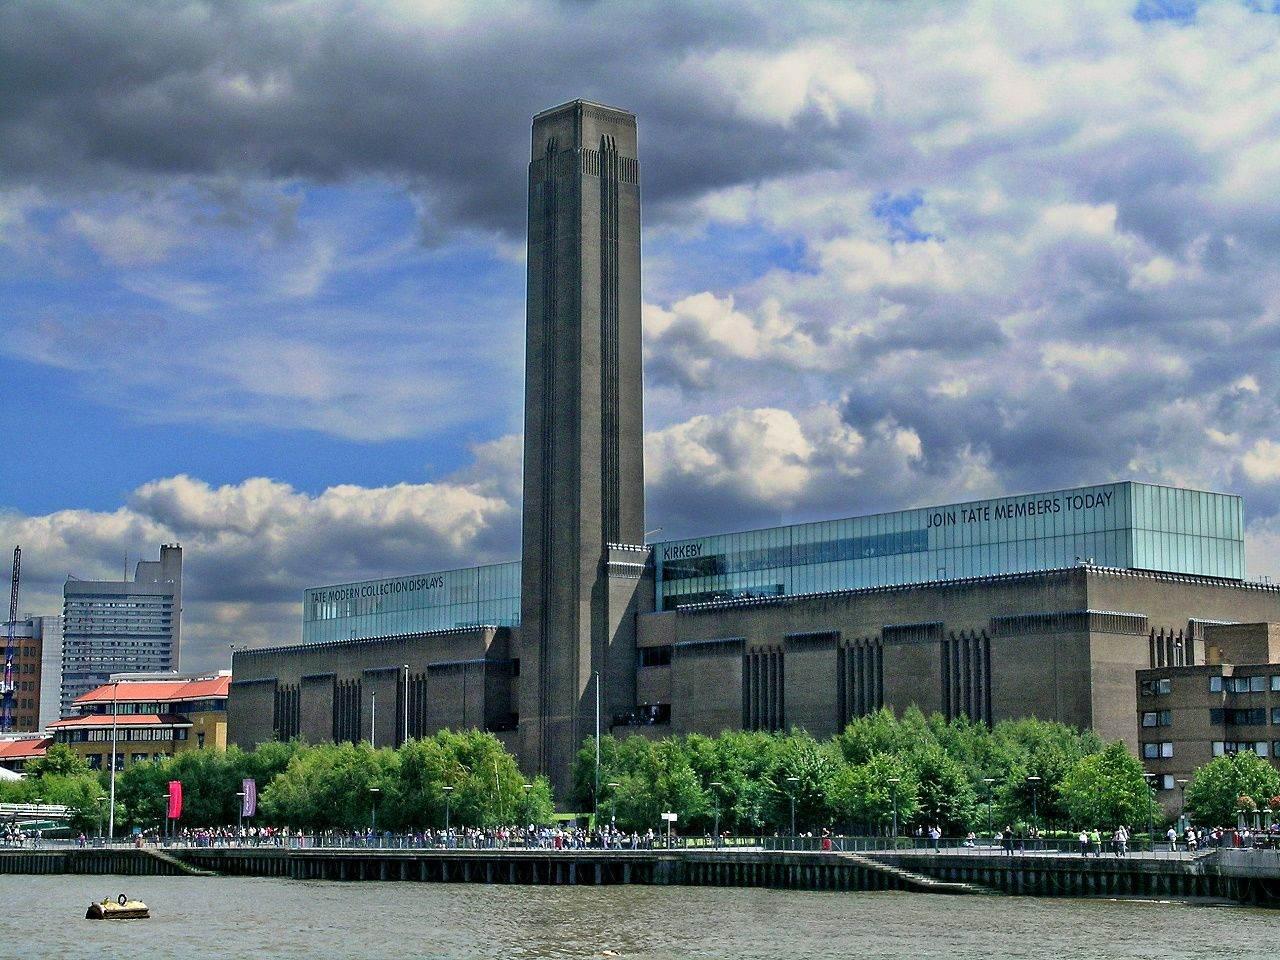 Tate Modern Londen